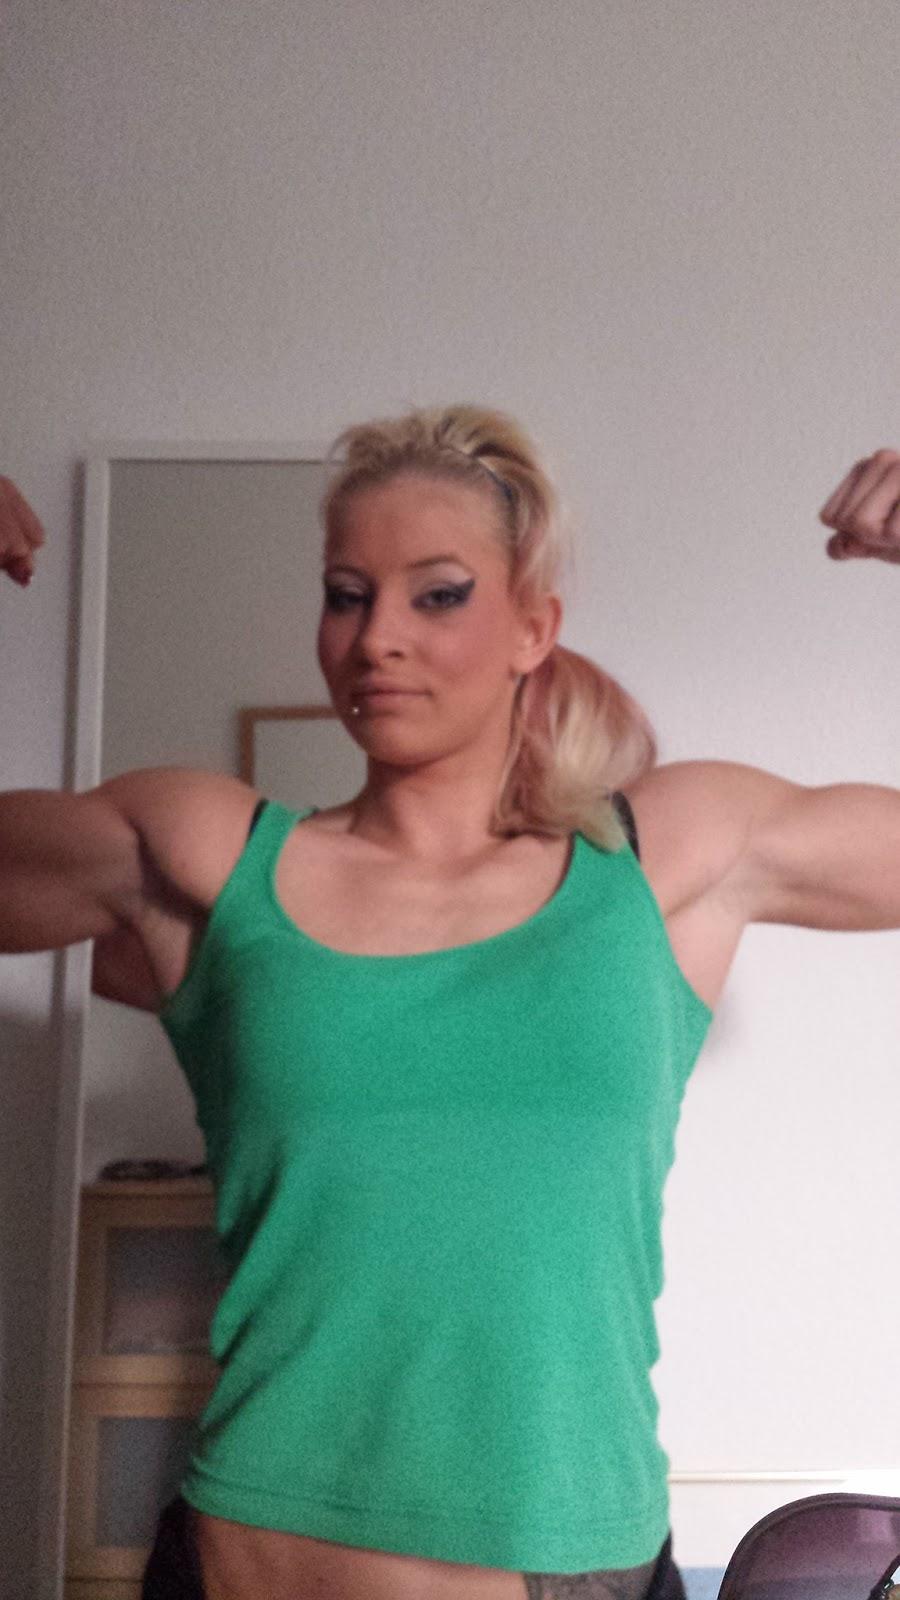 Female Bodybuilding: Women Bodybuilding At Best, She Looks